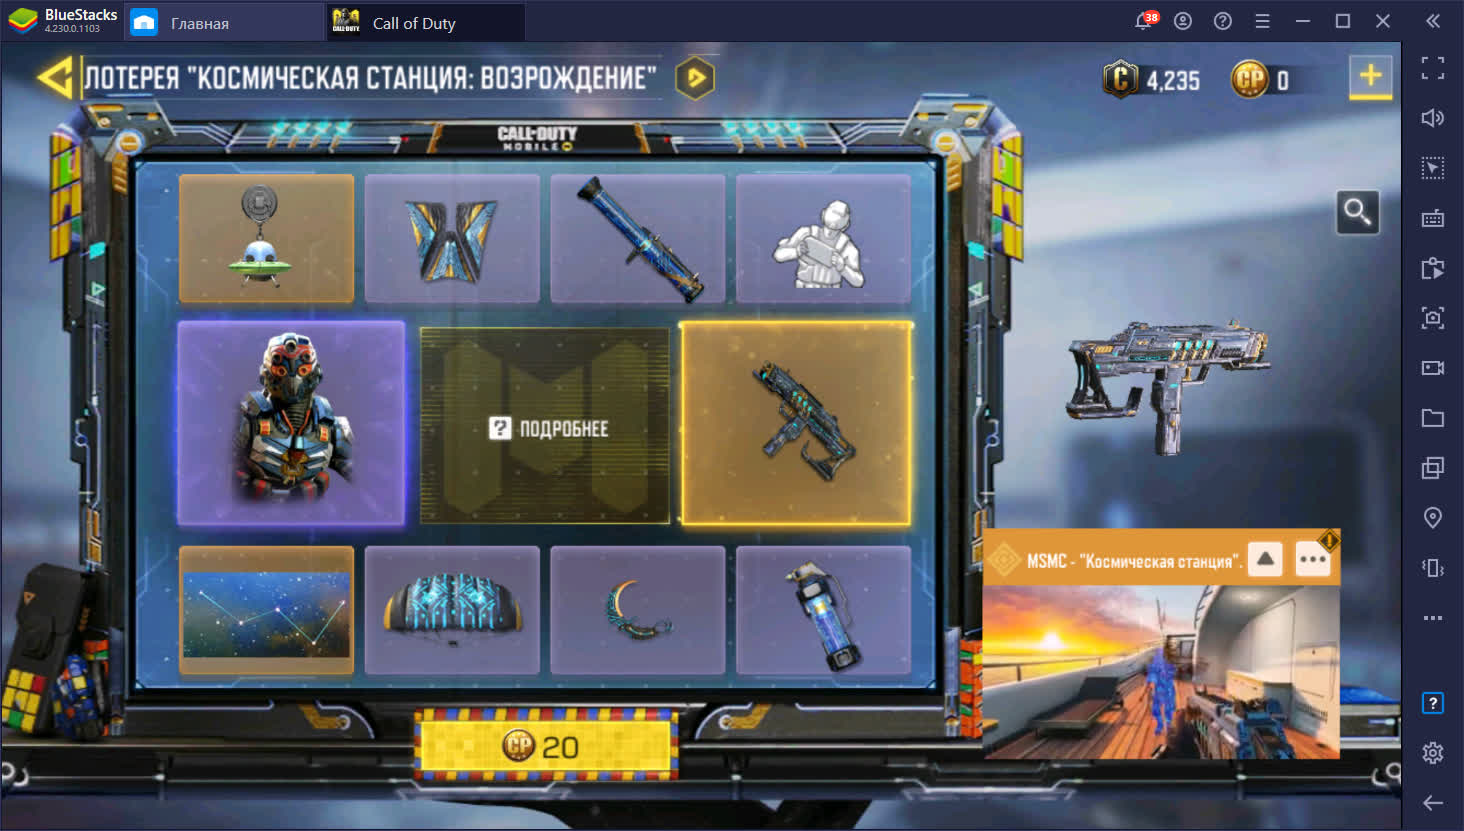 Обновление 1st Anniversary для Call of Duty: Mobile!